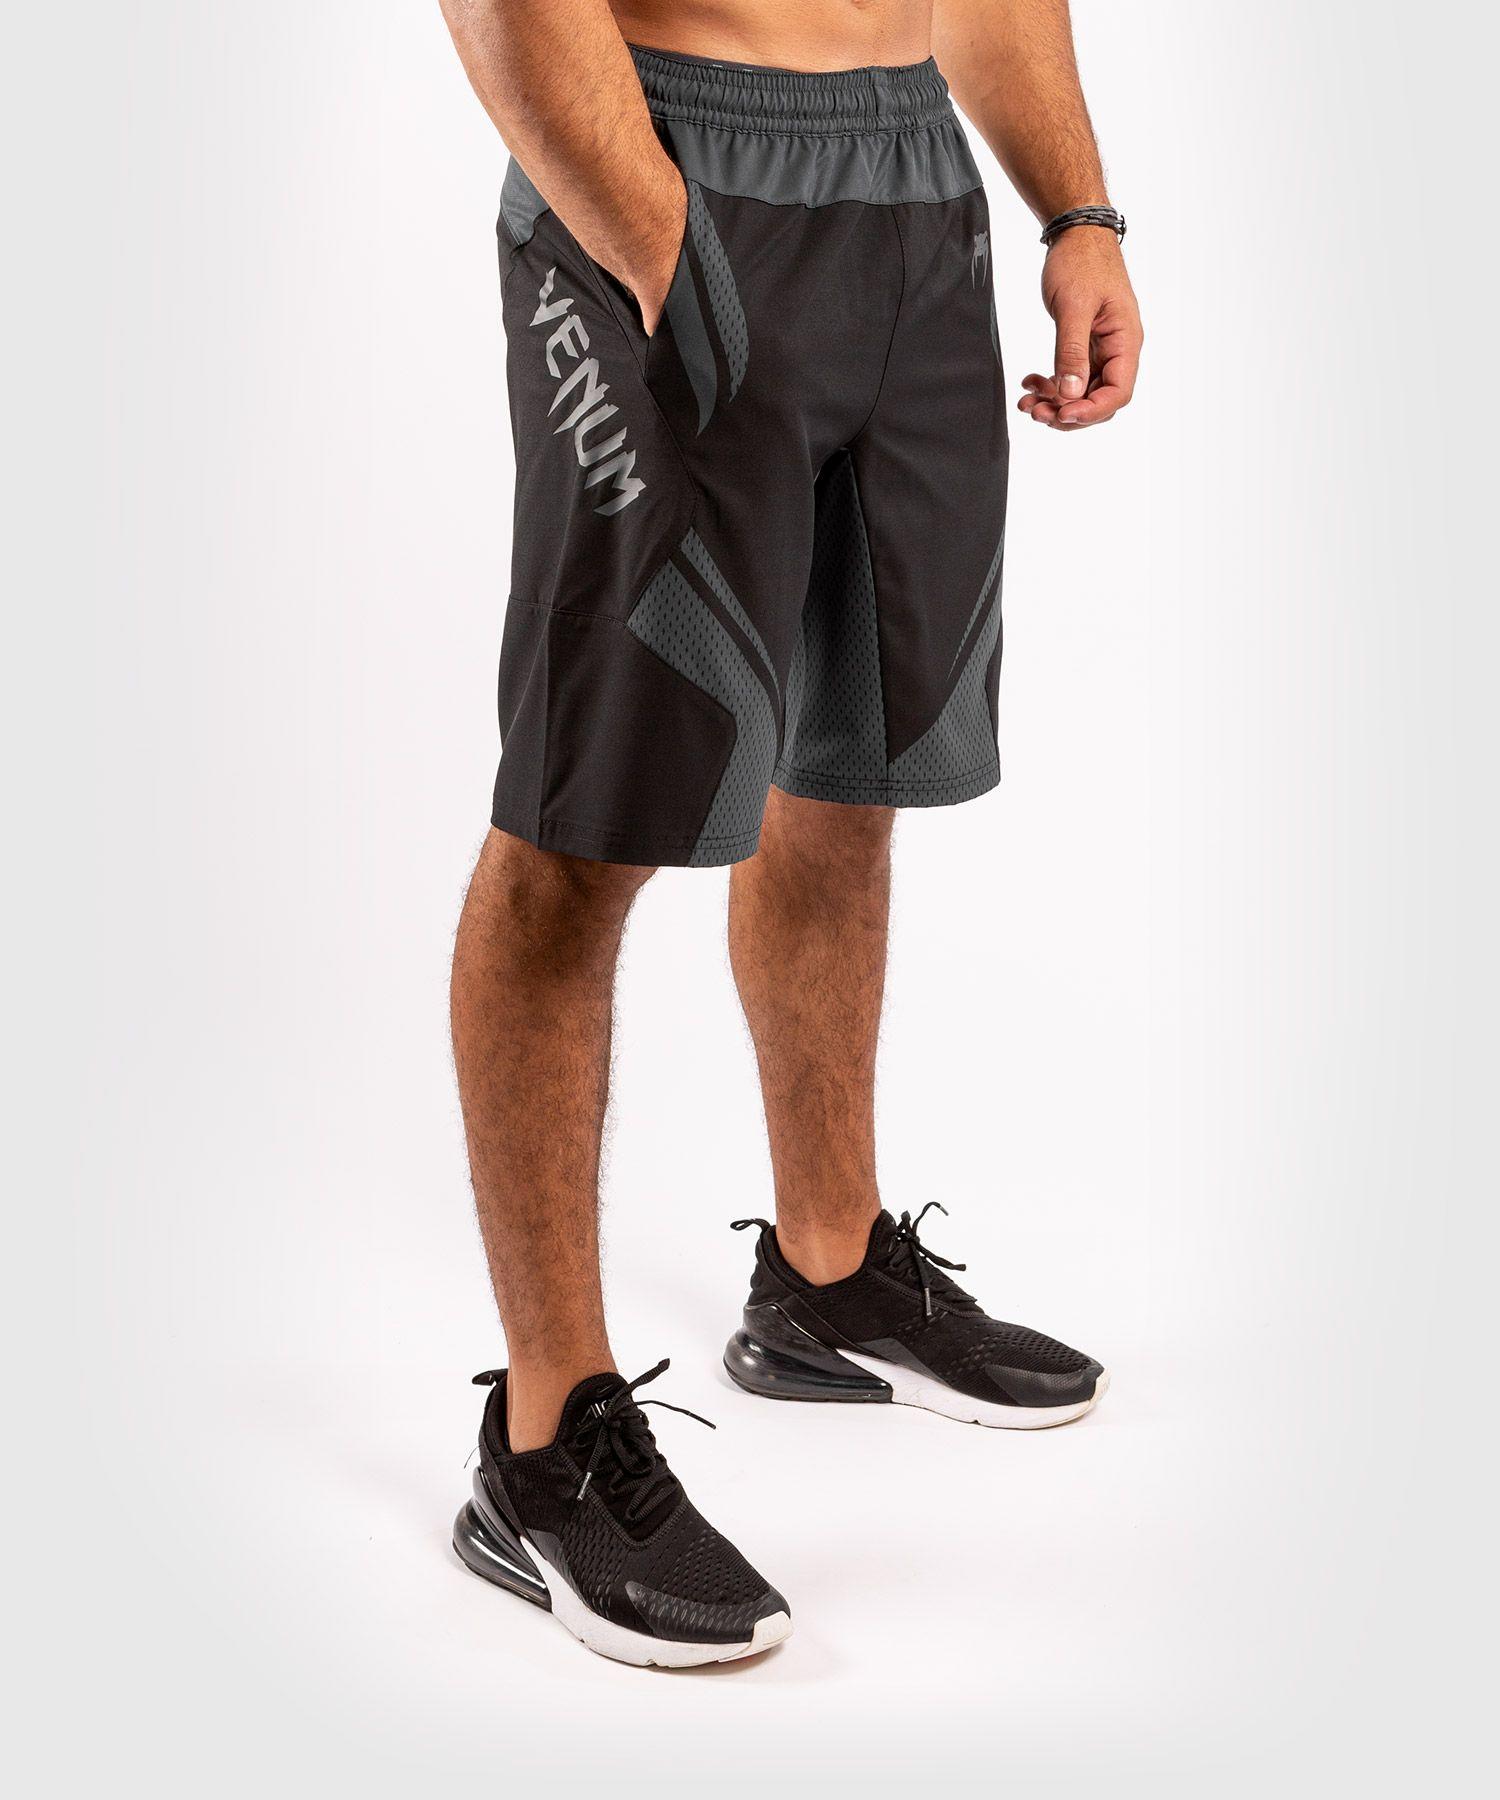 Шорты Venum ONE FC Impact Training Shorts Размер: S